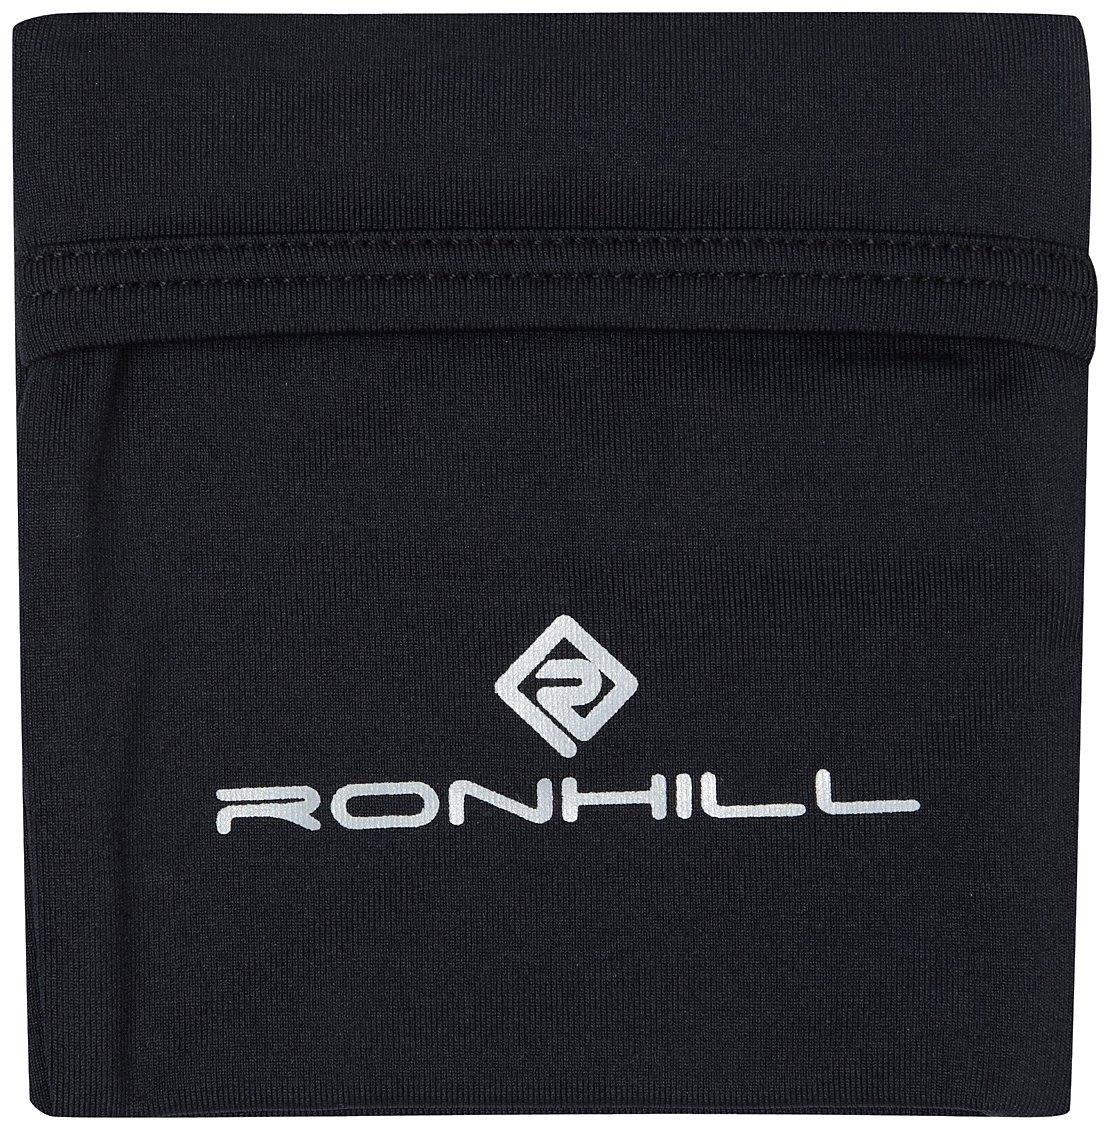 Ronhill Stretch Wrist Tasca - AW18